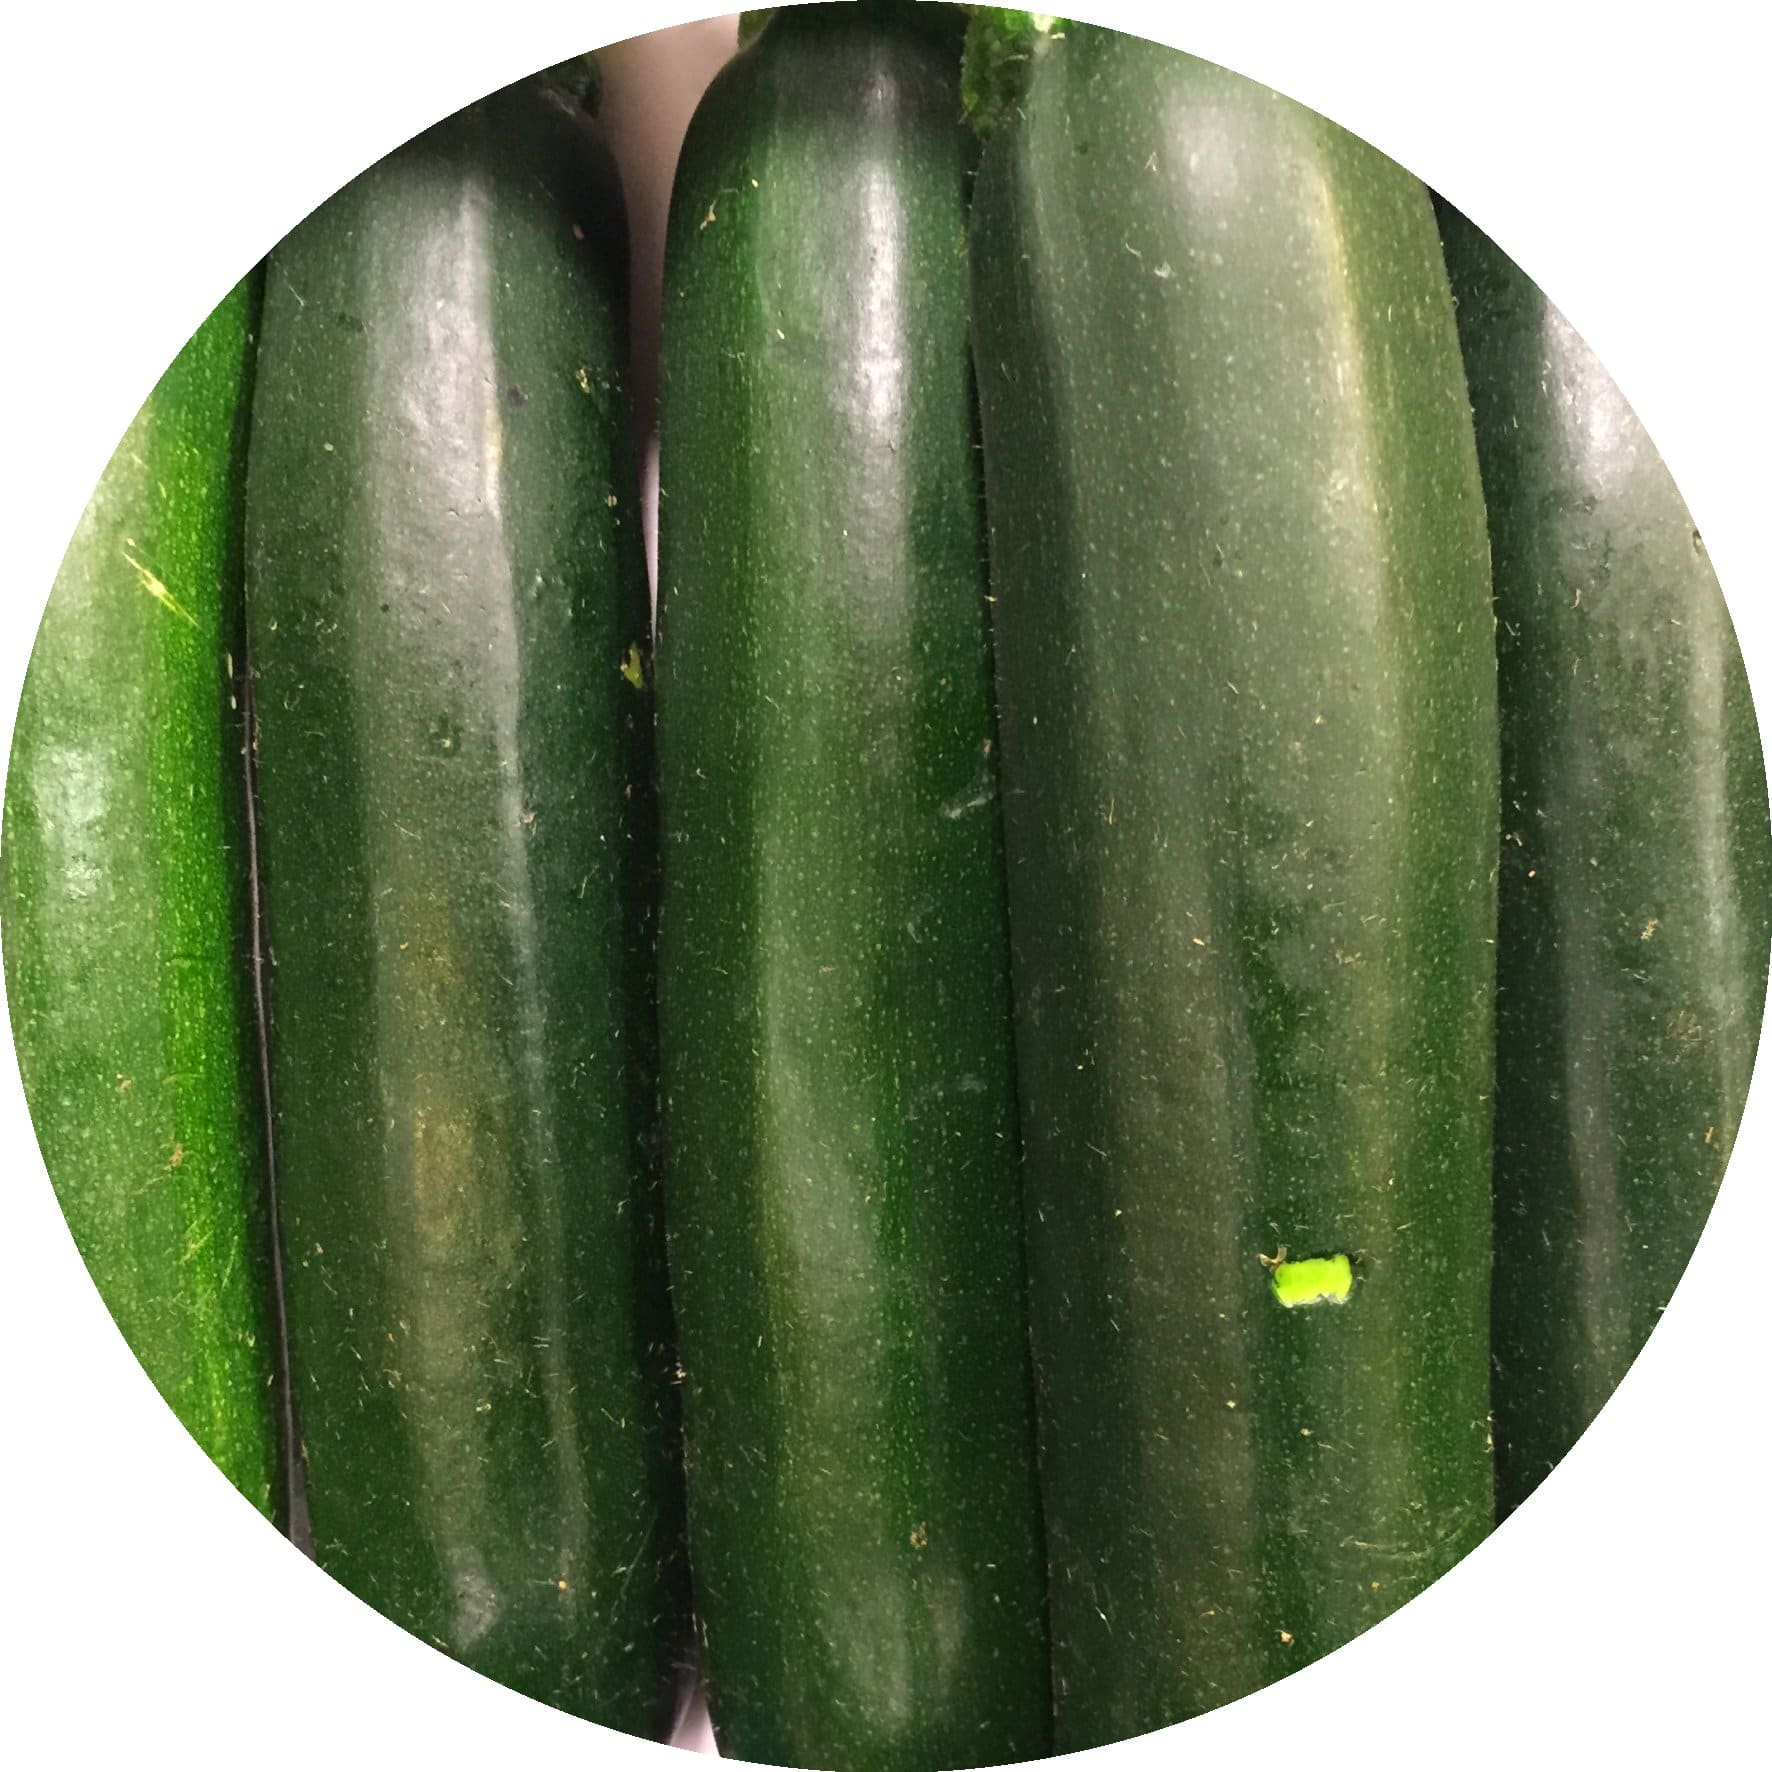 Zucchini_Saisonkalender_August